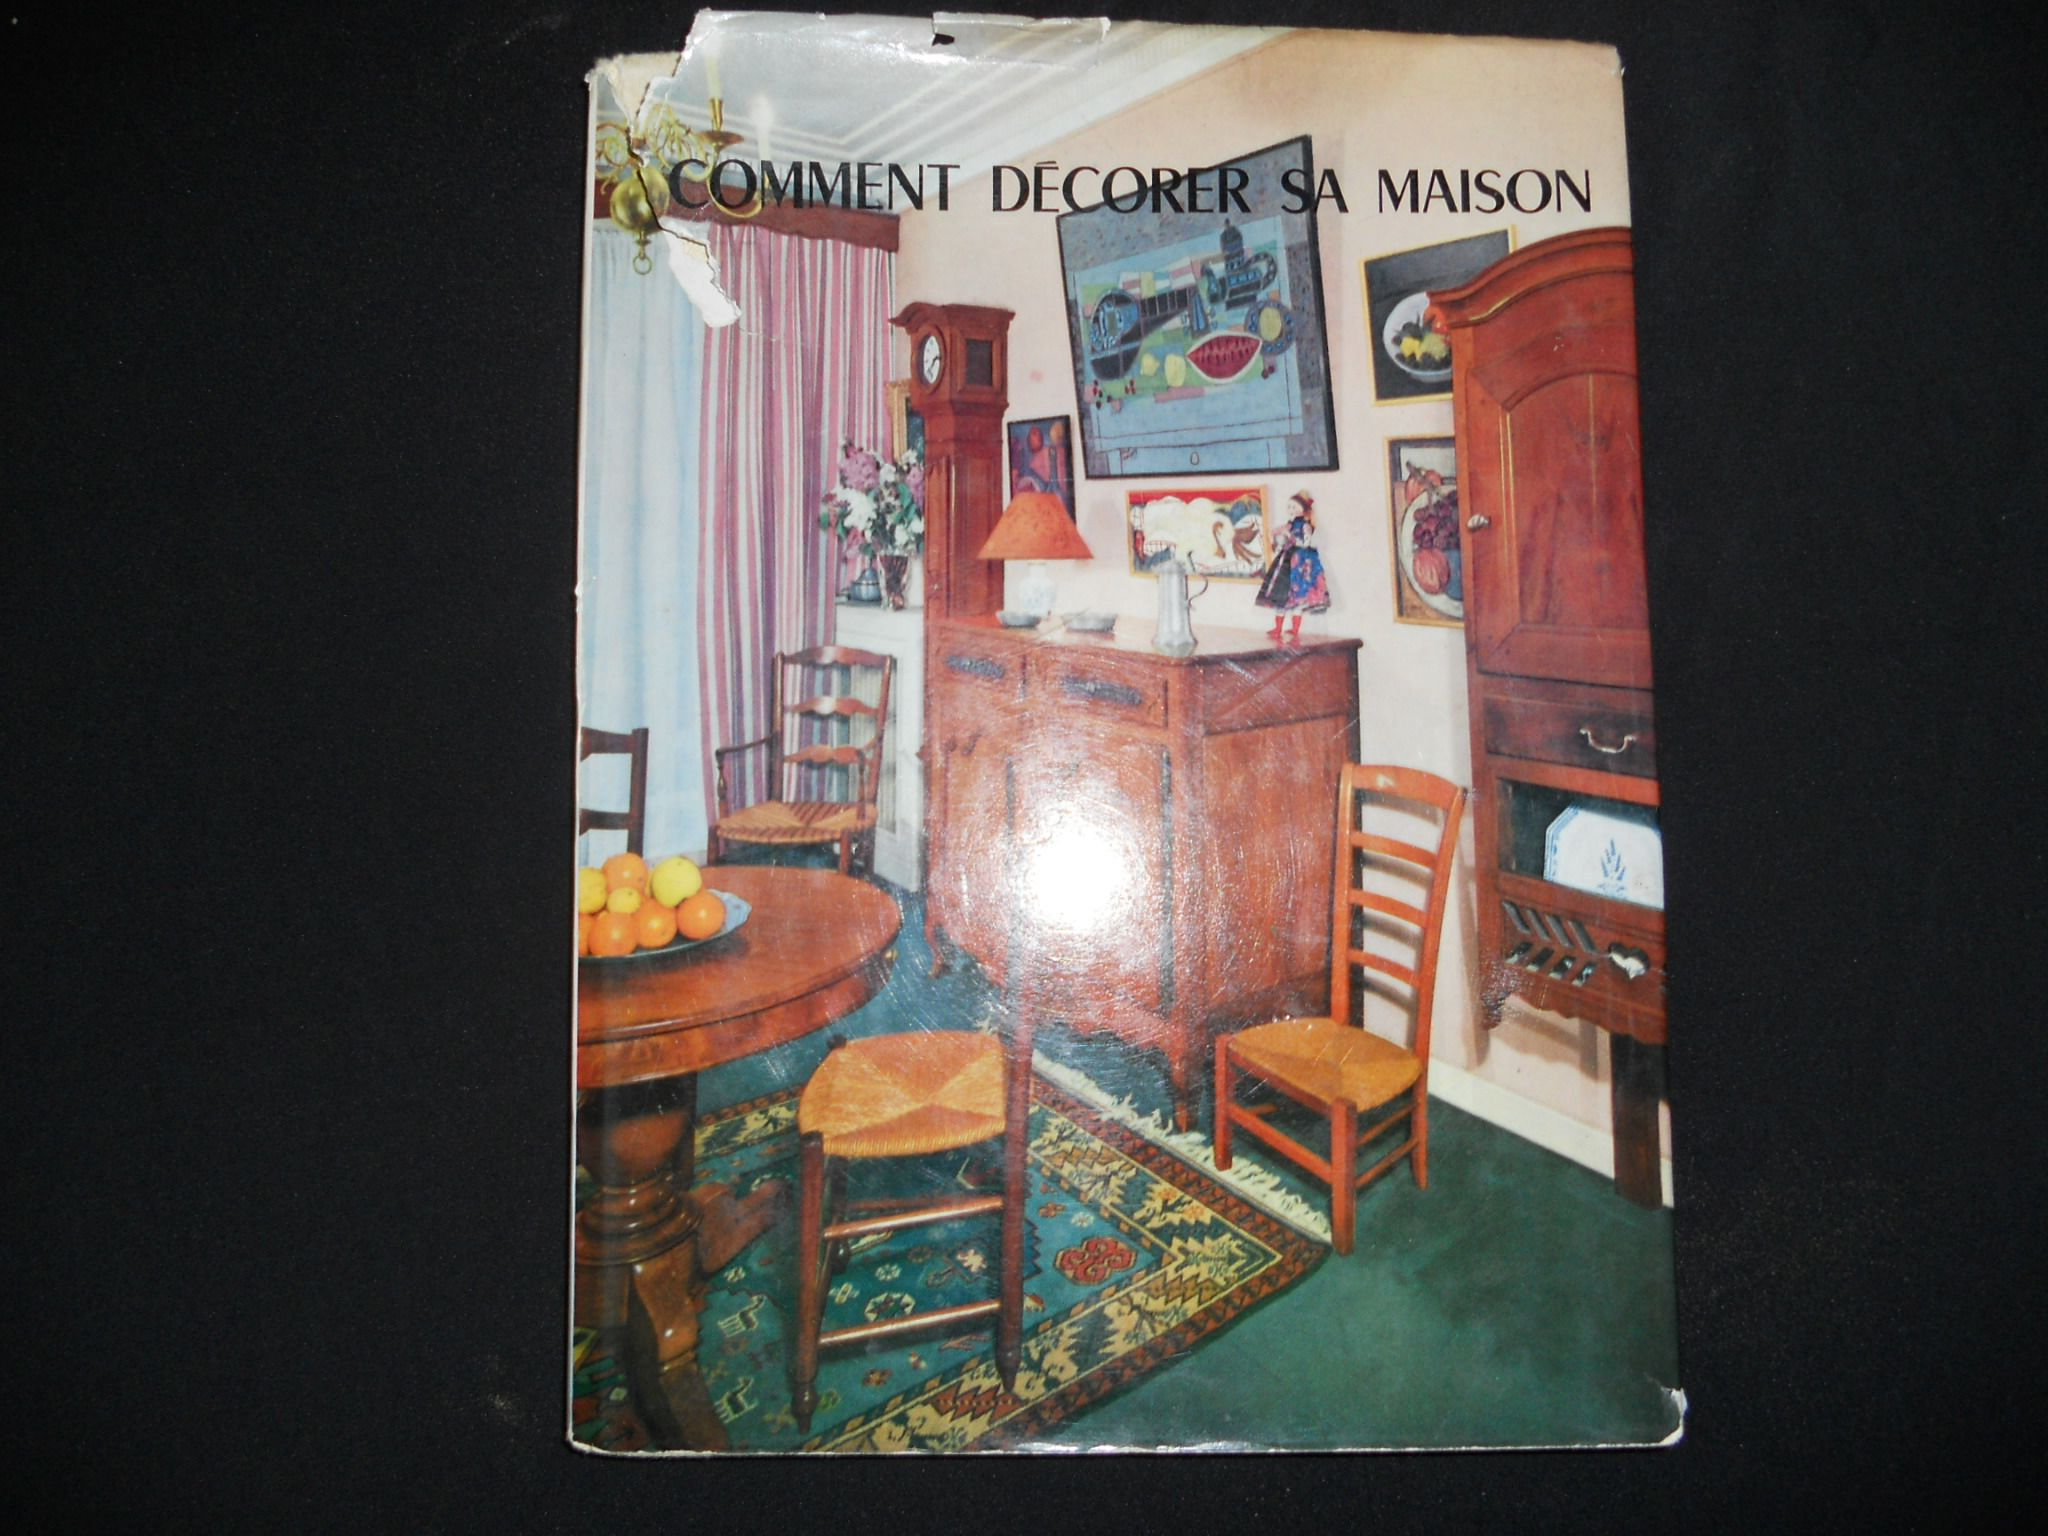 libro d 39 antiquariato comment decorer sa maison editions charles massin ebay. Black Bedroom Furniture Sets. Home Design Ideas